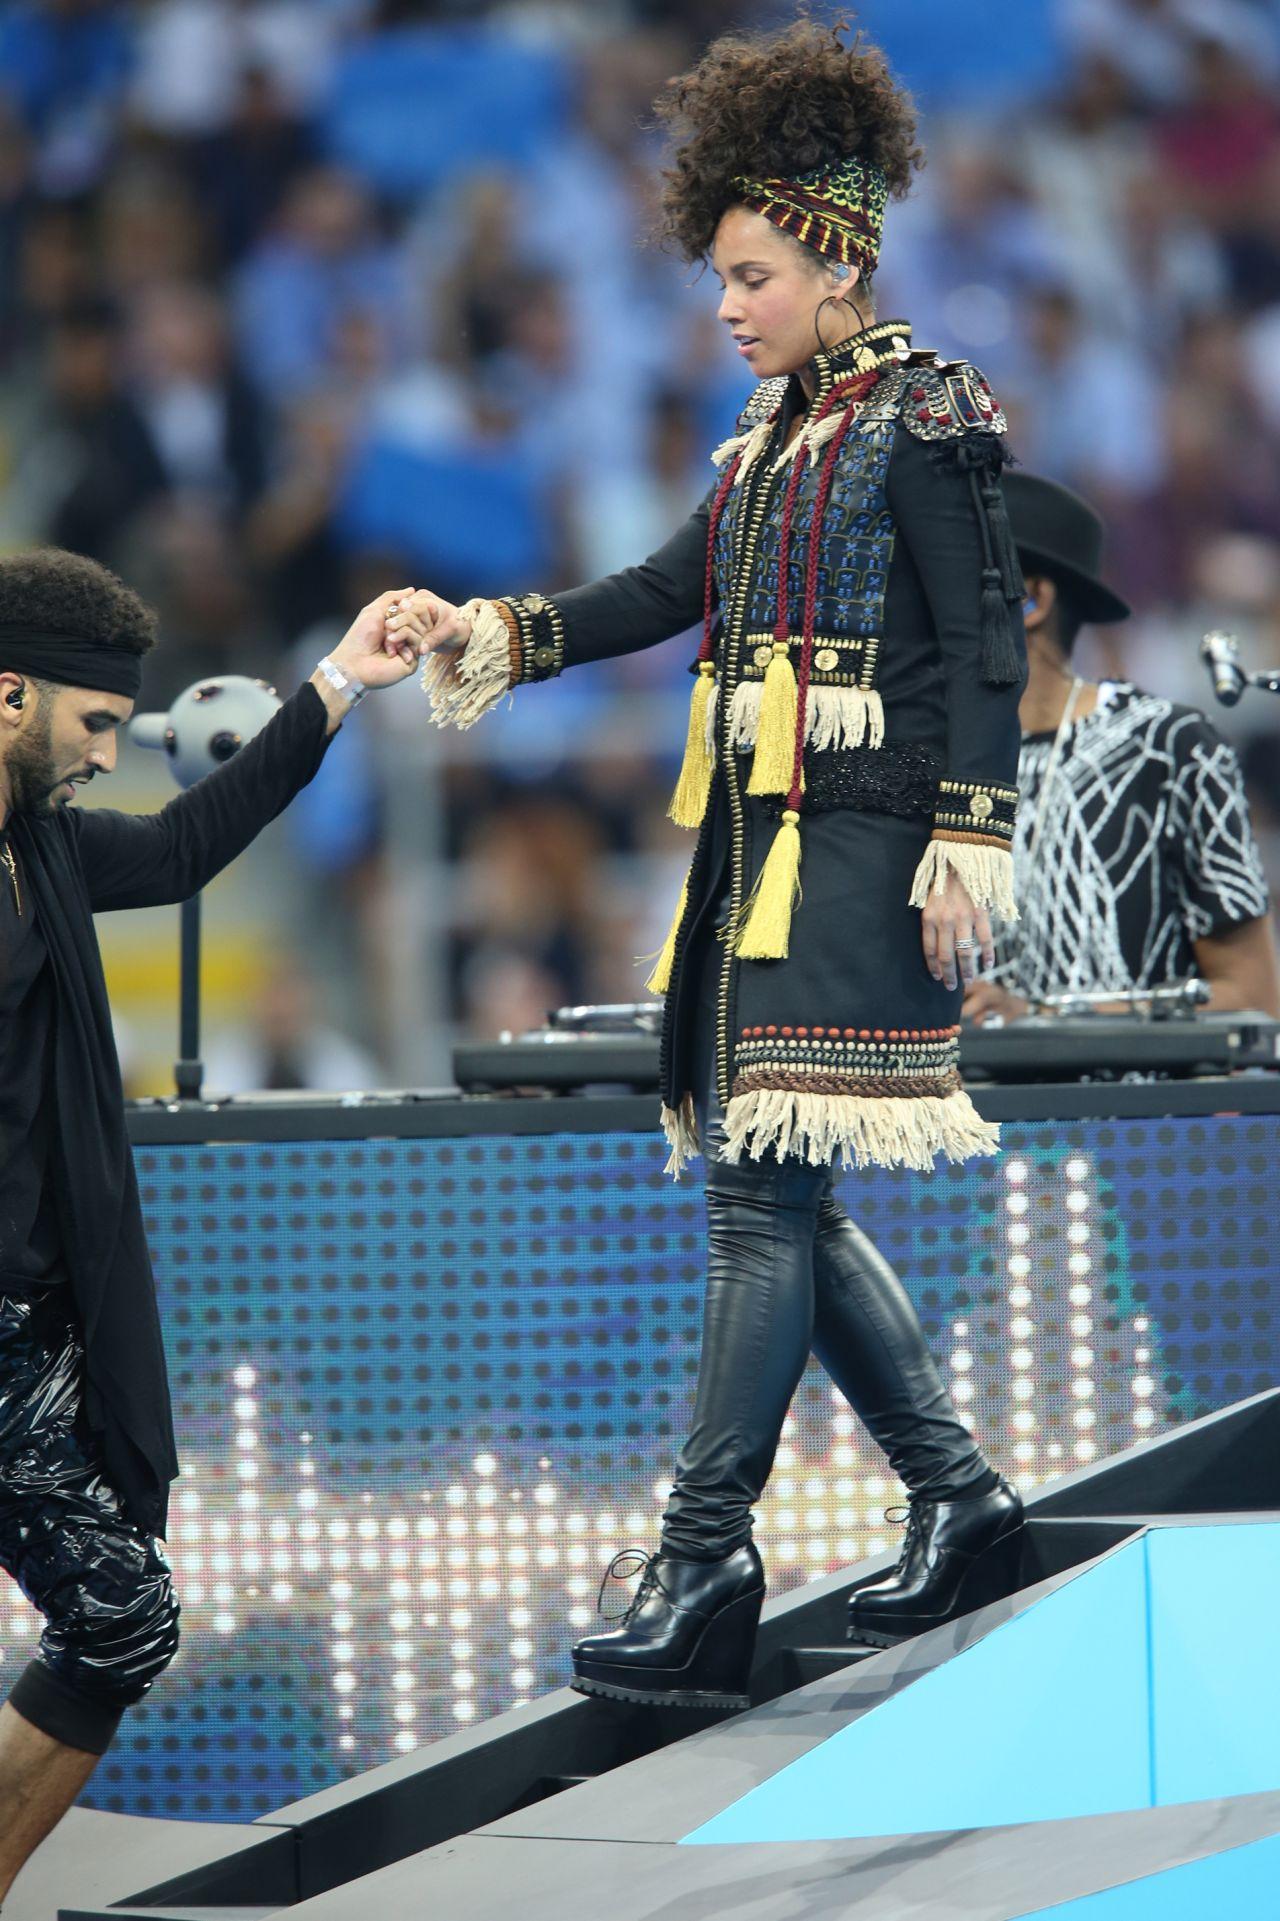 Alicia Keys Gives a Concert the UEFA Champions League Final at Milan Italy 5282016